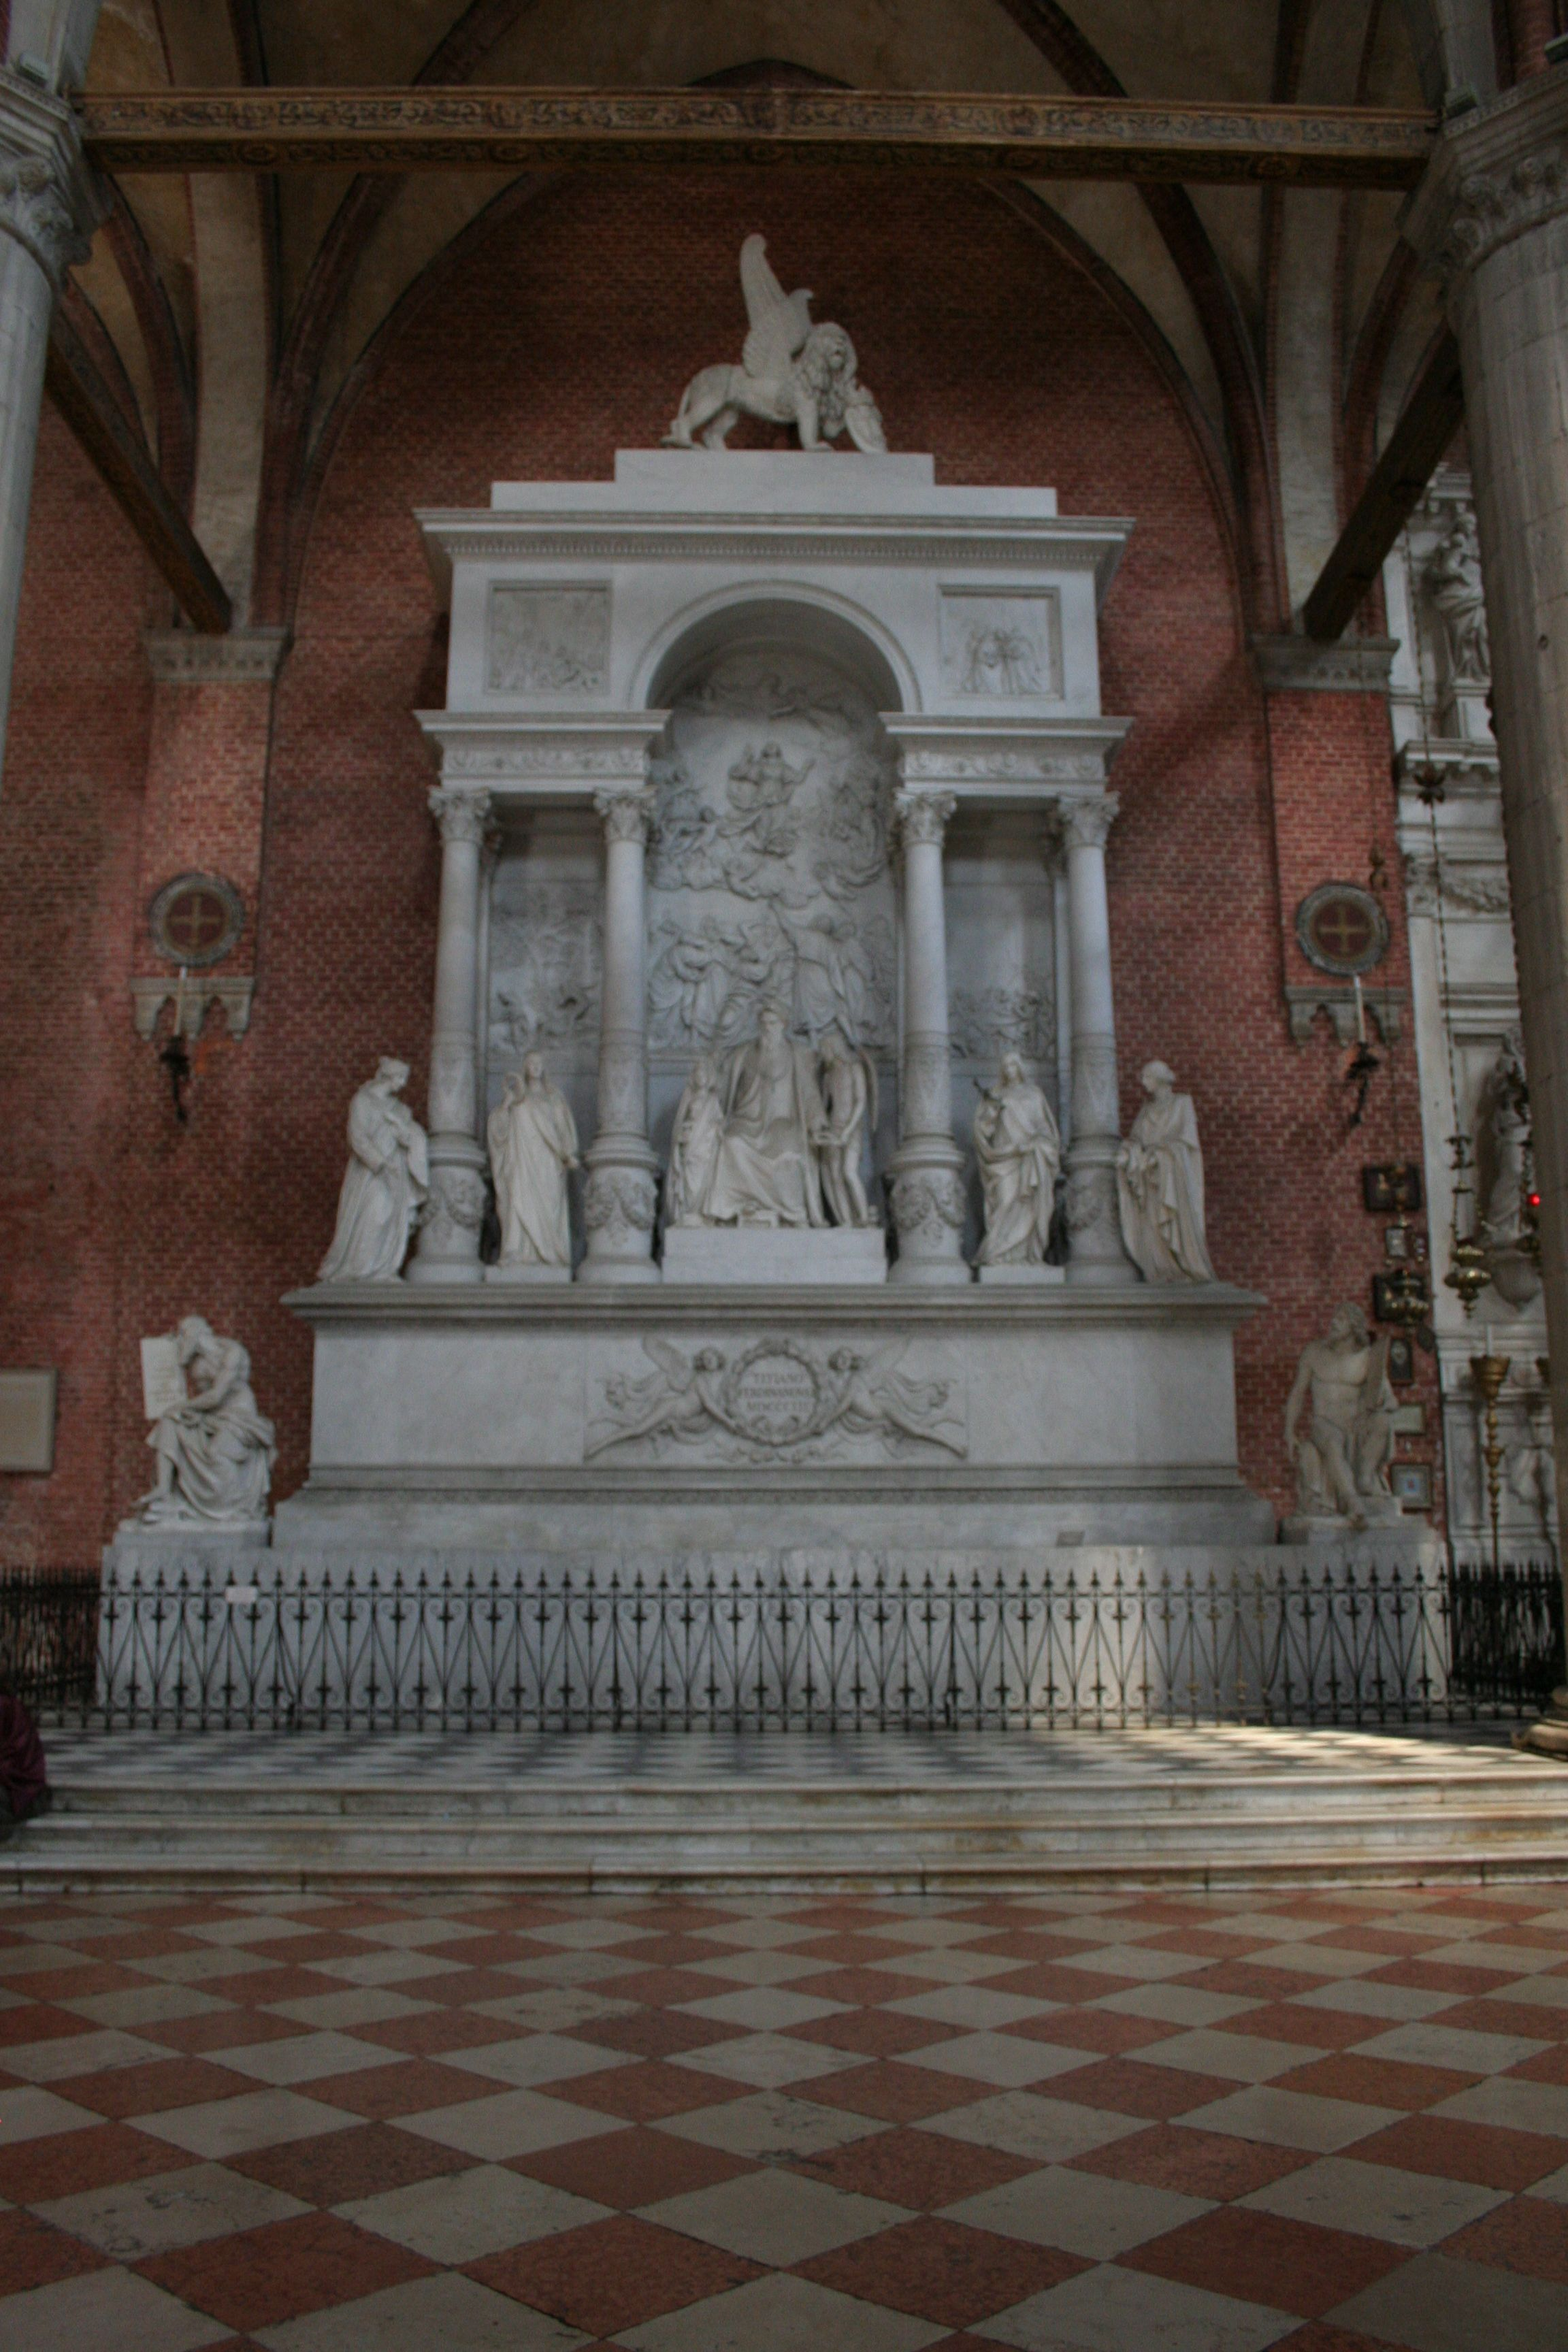 Titian's Memorial, Frari Church, Venice, Italy